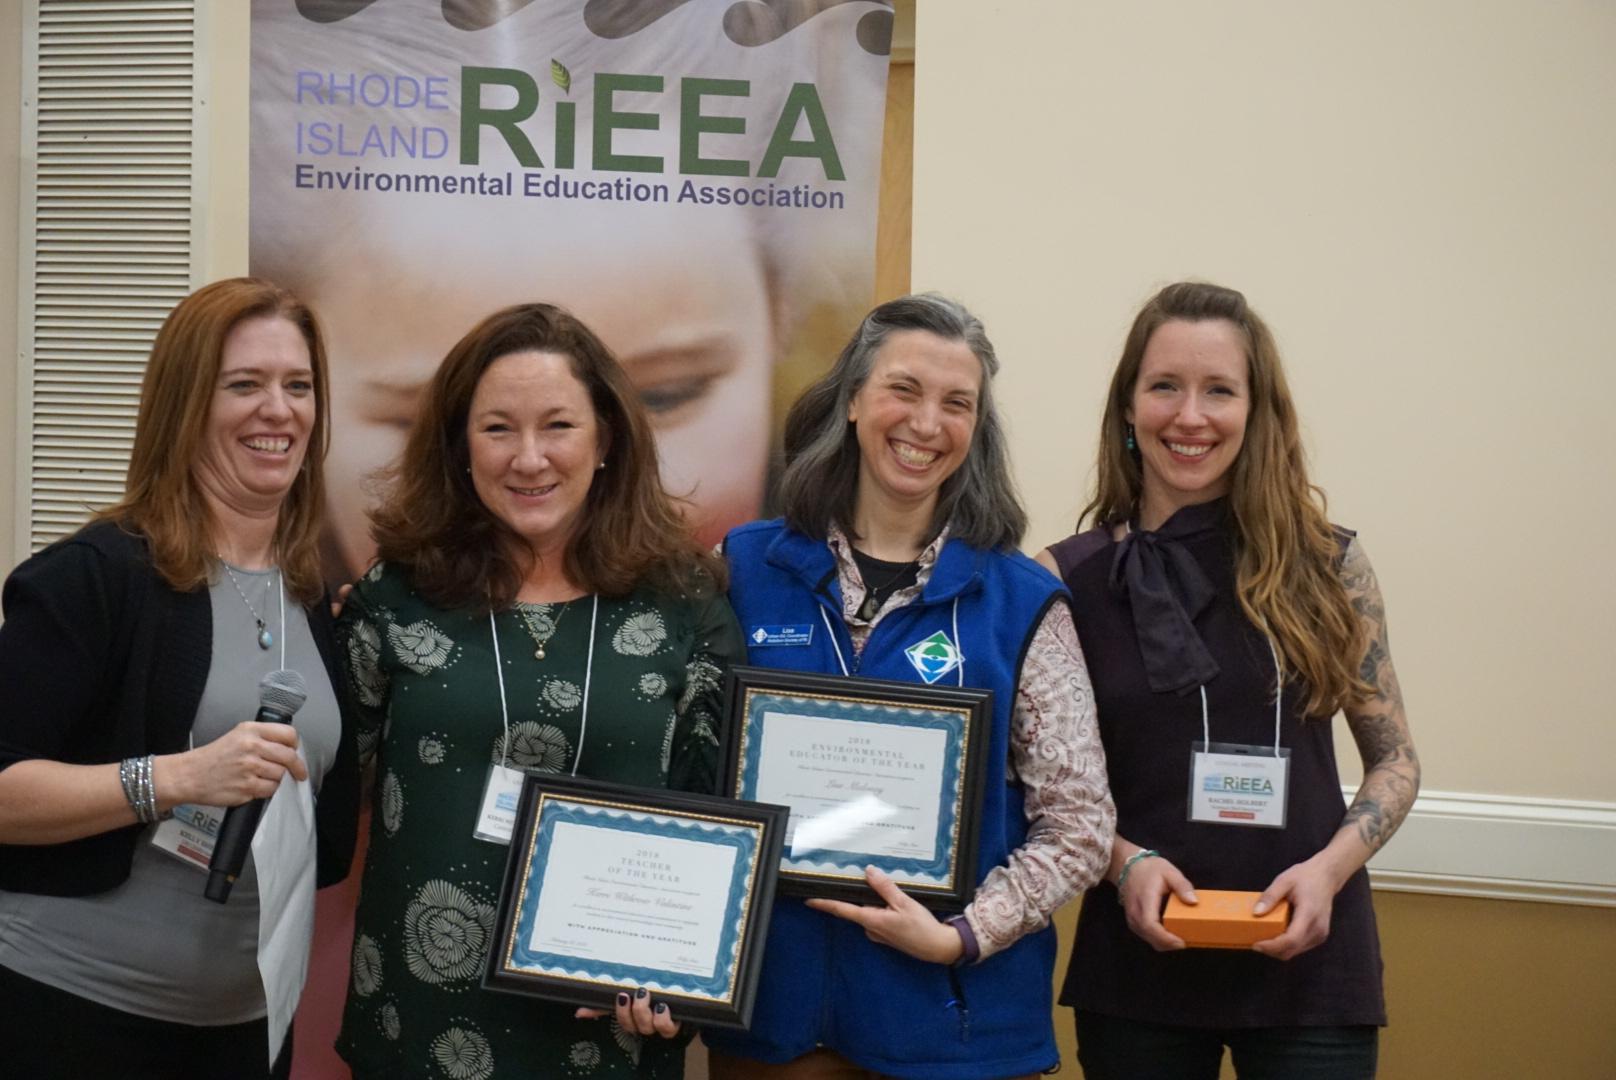 Audubon Educator Lisa Maloney Honored as Environmental Educator of the Year